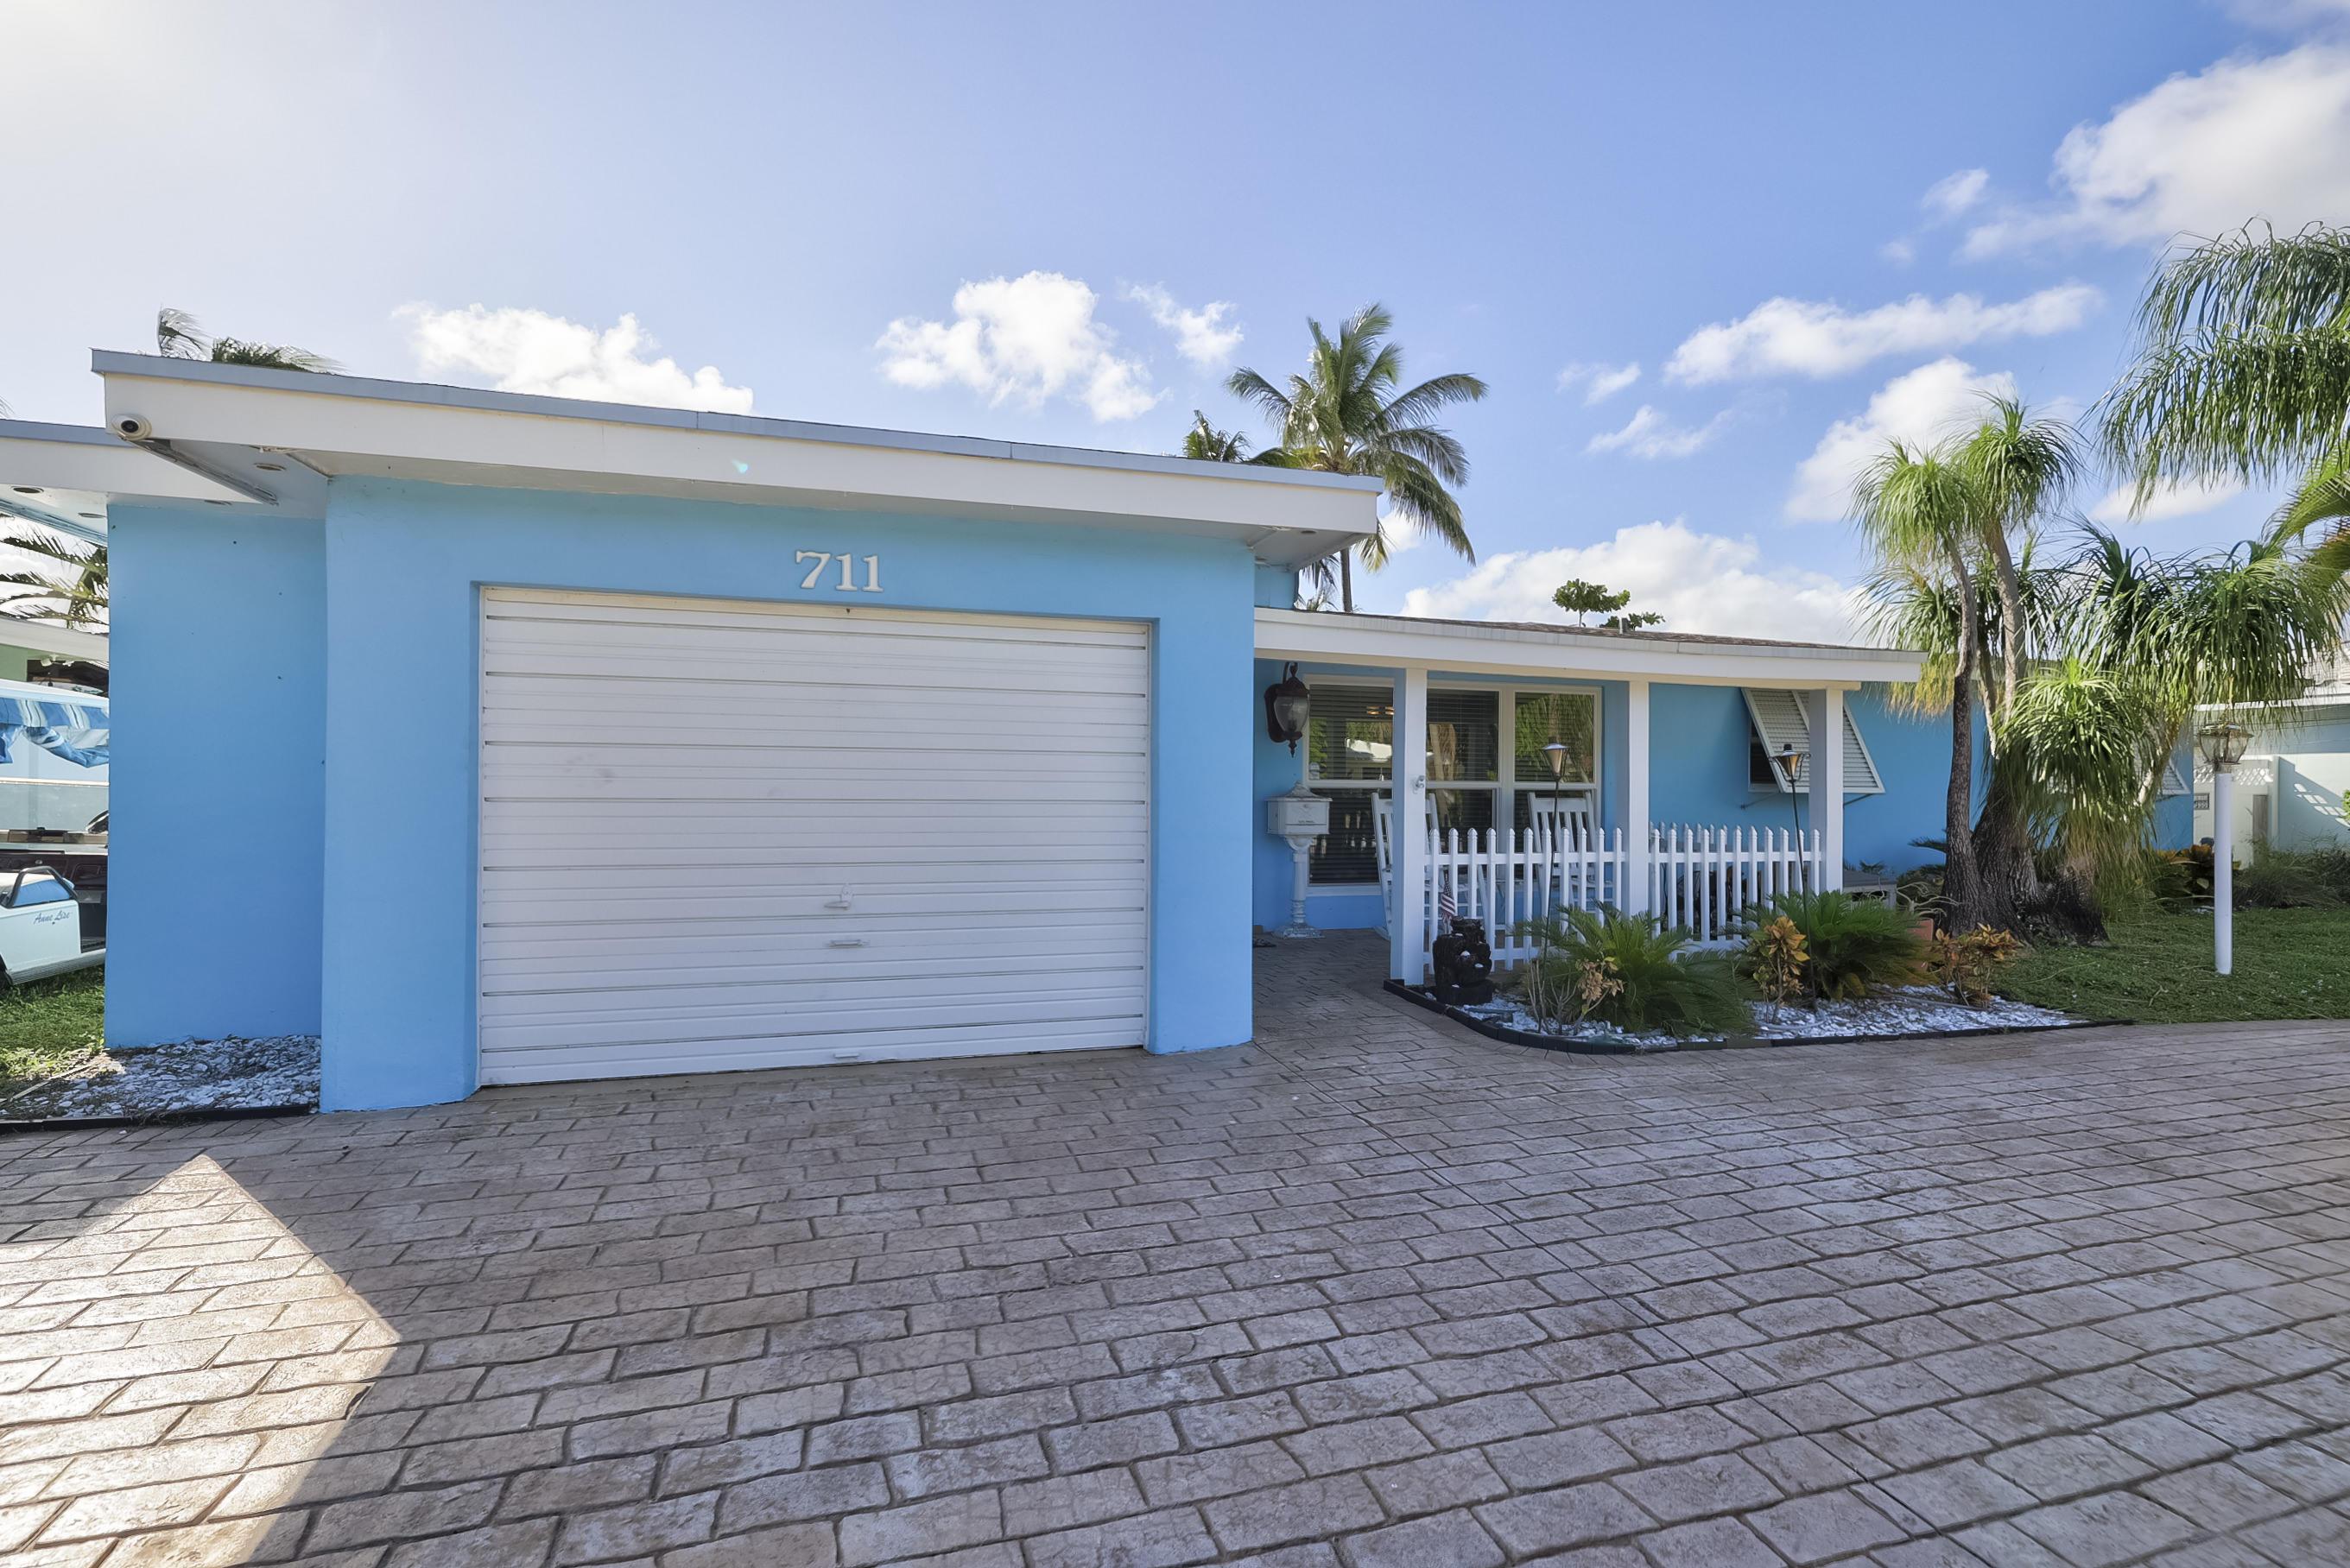 711 5 Avenue, Pompano Beach, Florida 33060, 3 Bedrooms Bedrooms, ,3 BathroomsBathrooms,Residential,For Sale,5,RX-10667114